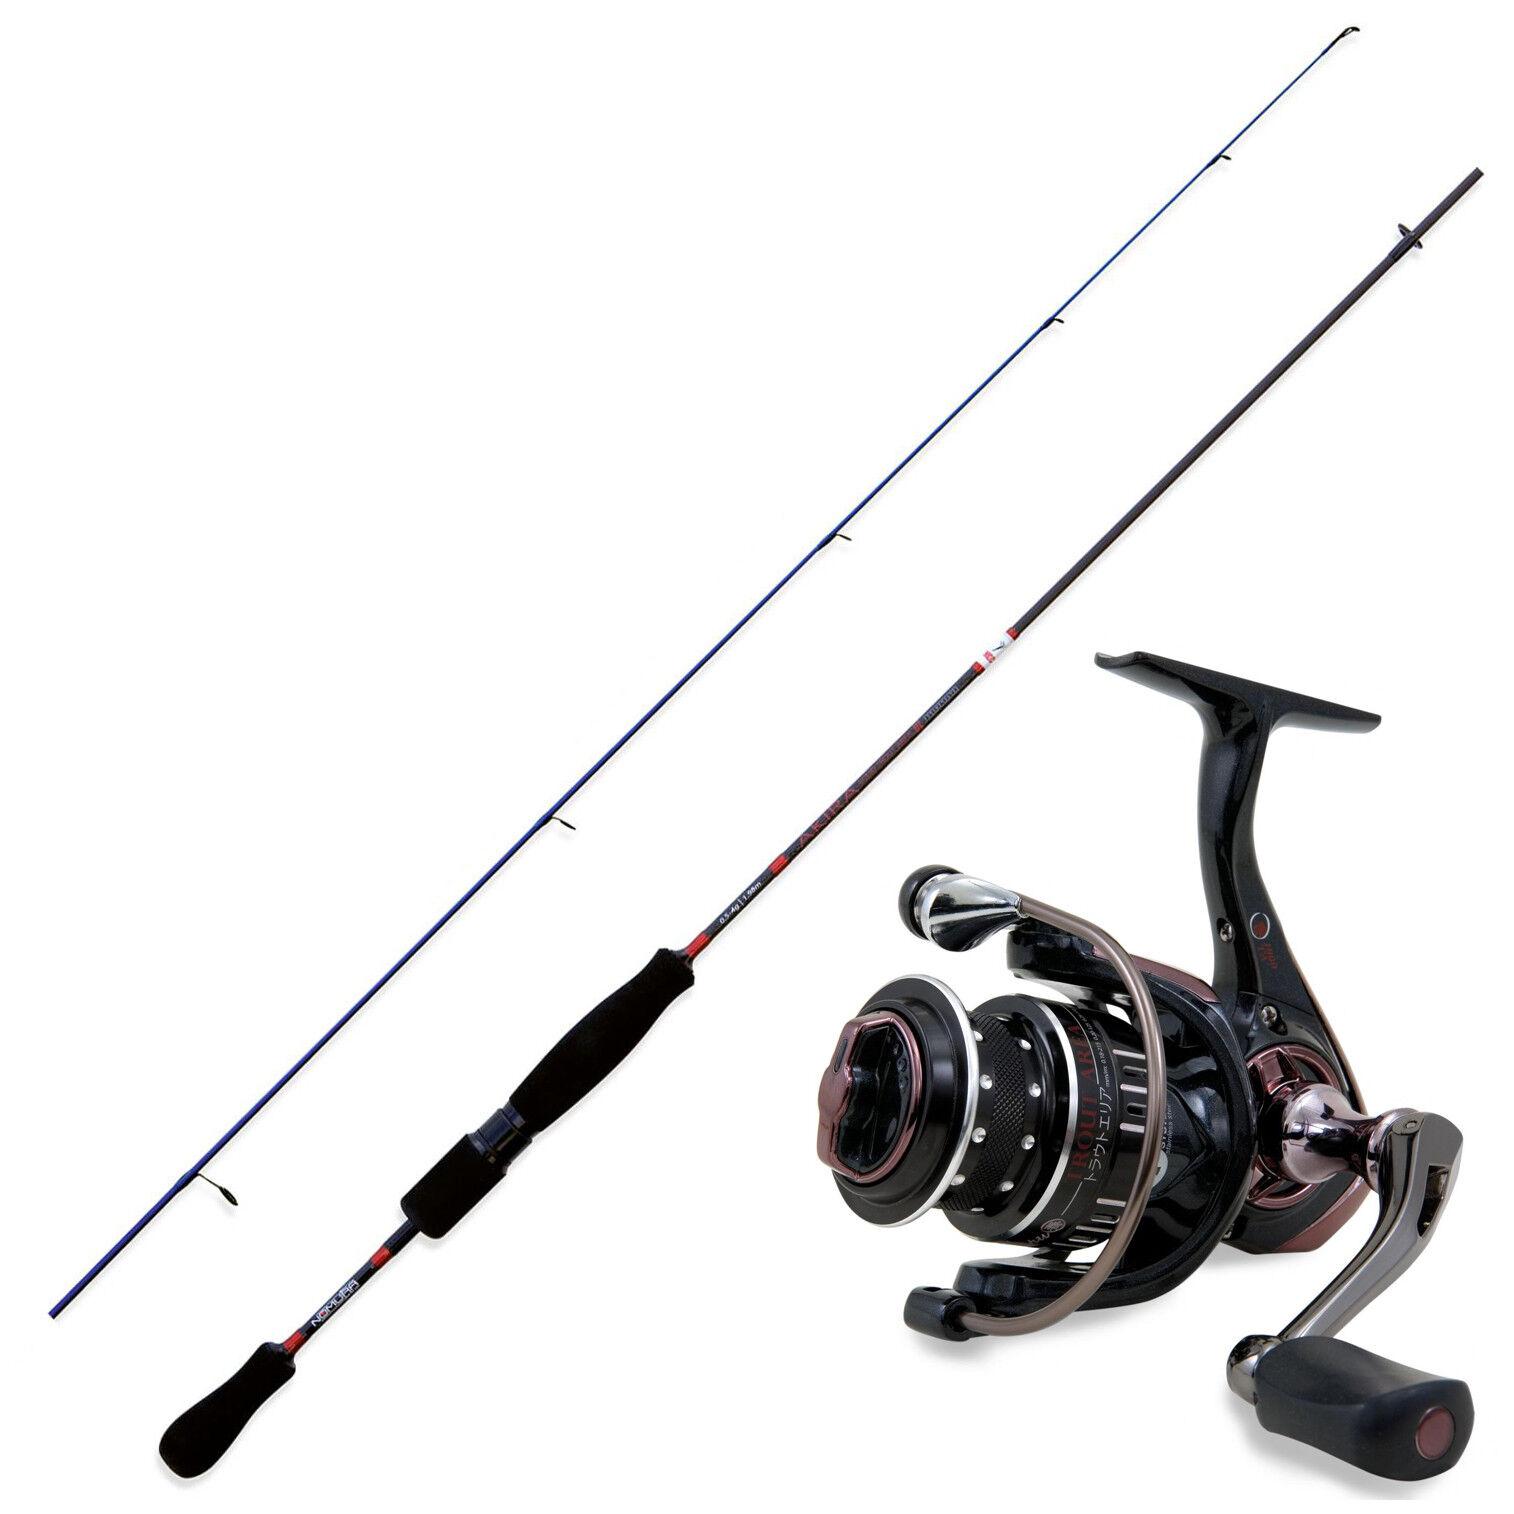 KP3574 Kit Pesca Trout Area Nomura Canna Akira Solid 1,70 m + Mulinello Har CASG